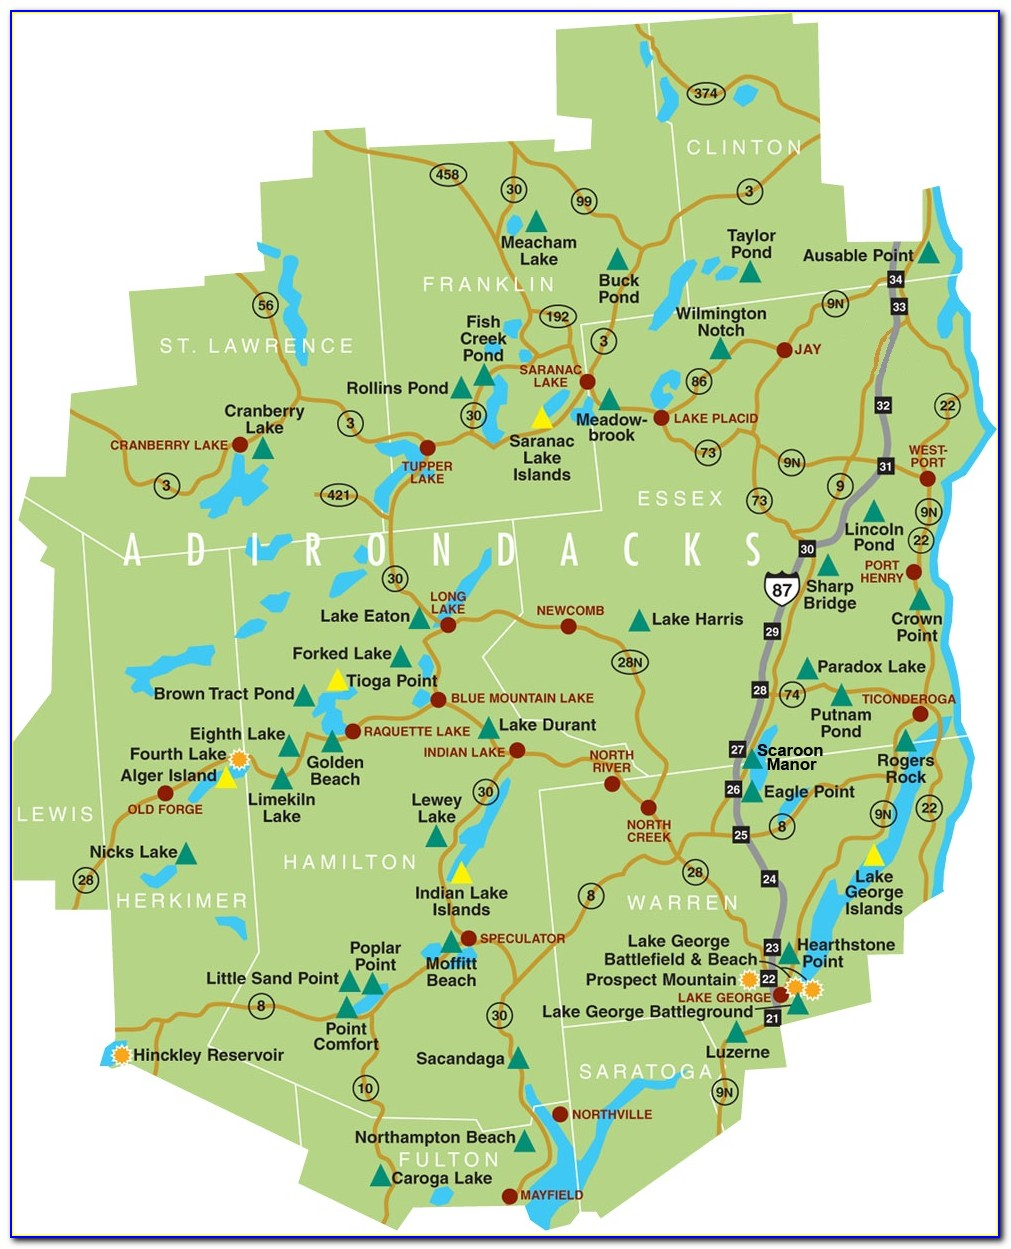 Topo Maps Of The Adirondacks